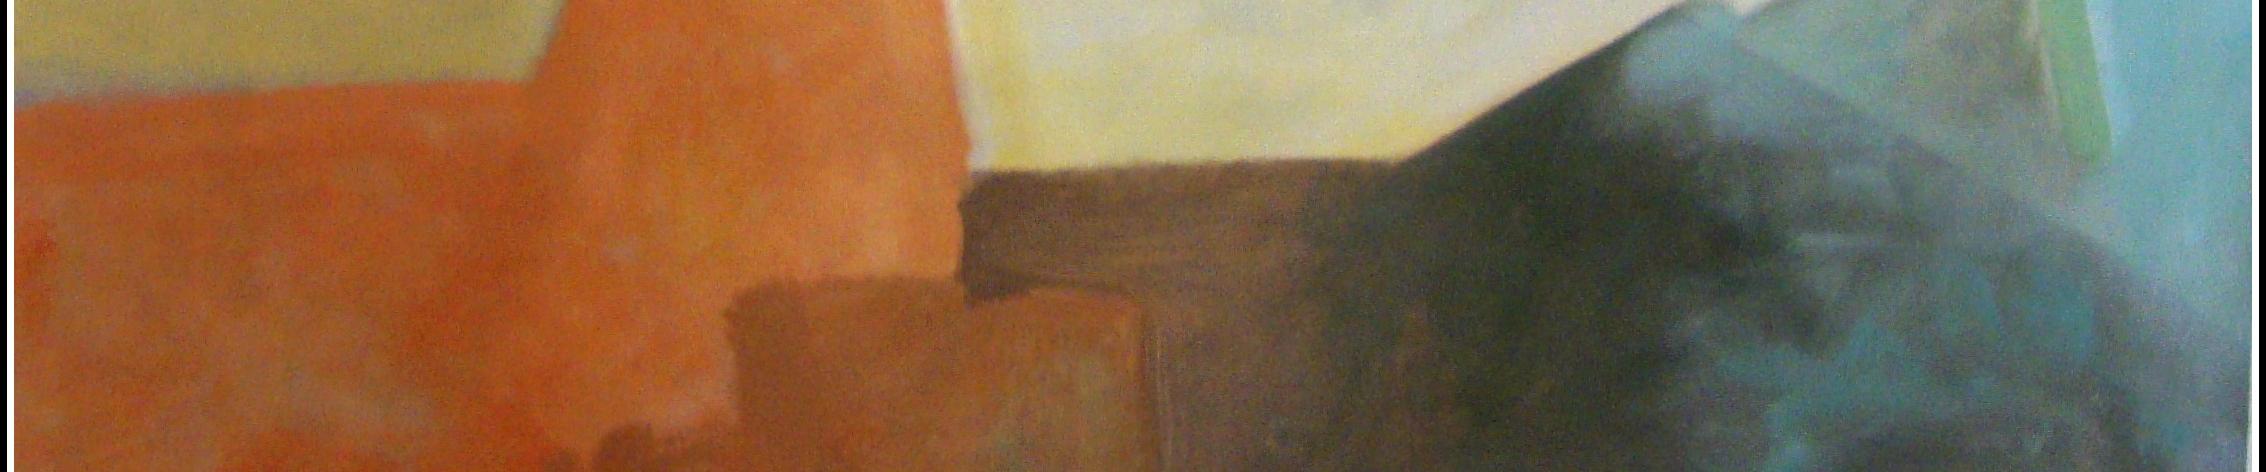 Galerie de Peinture de Claudine Boucq